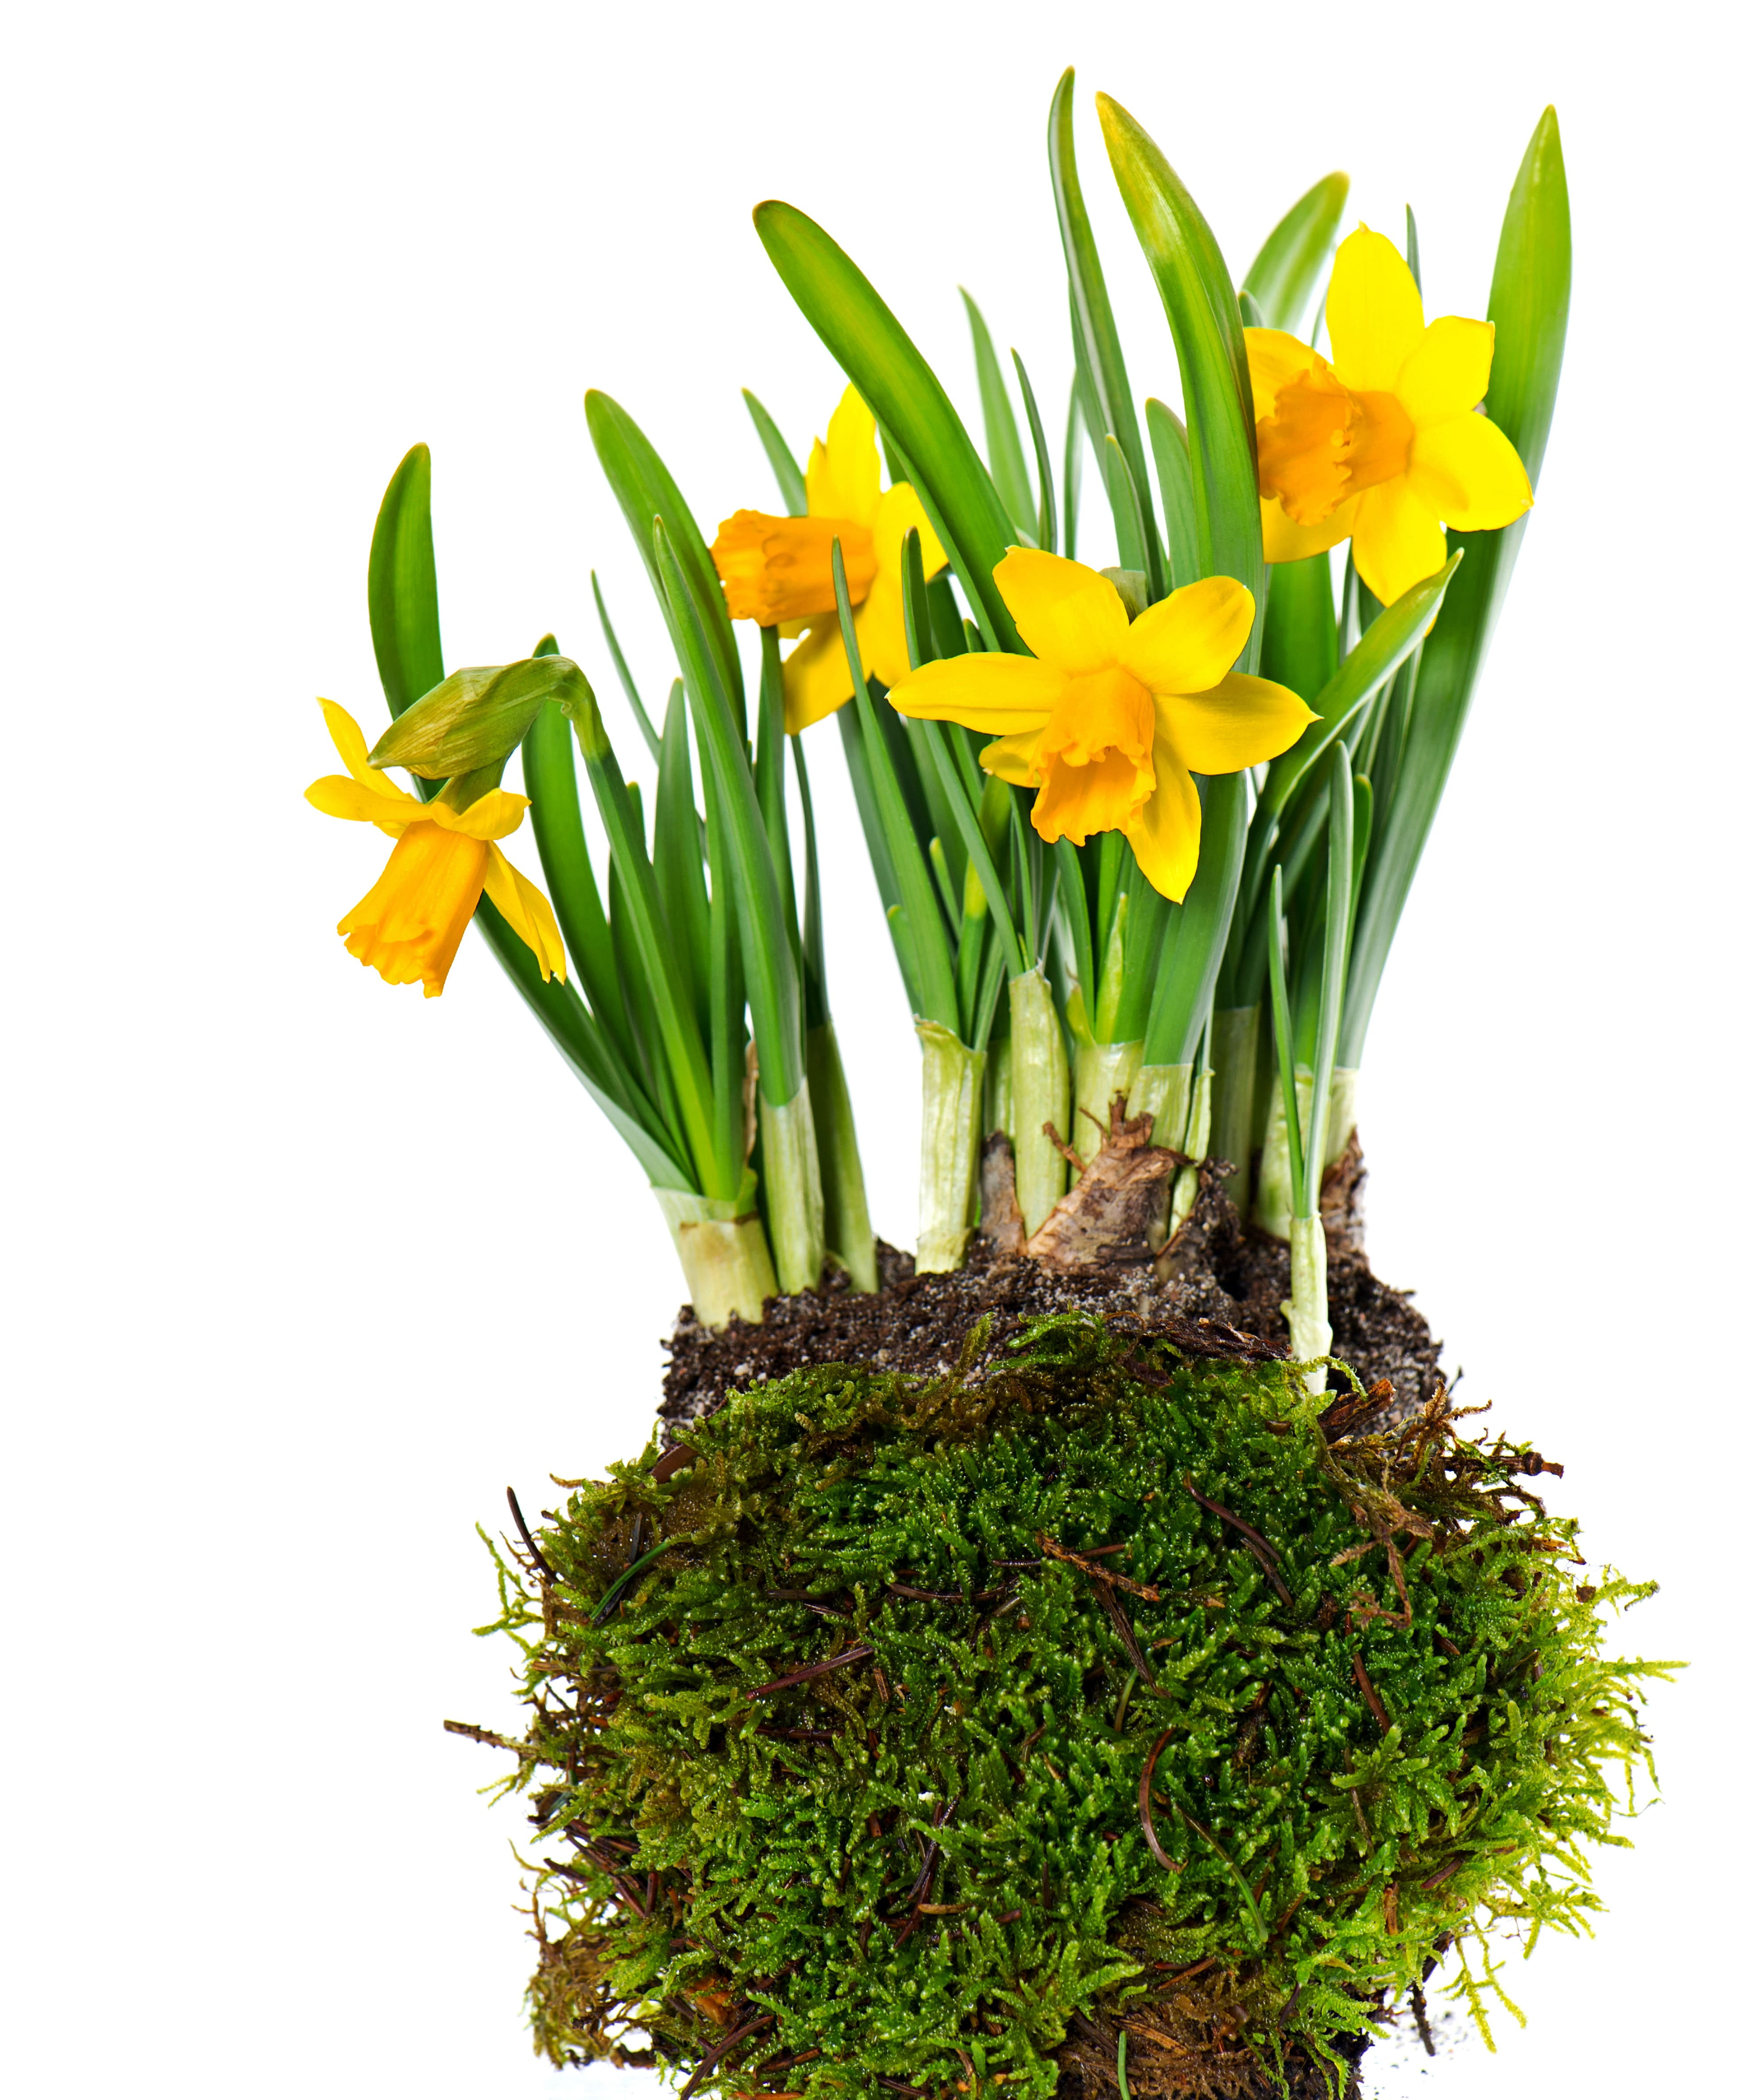 daffodils-photo-74